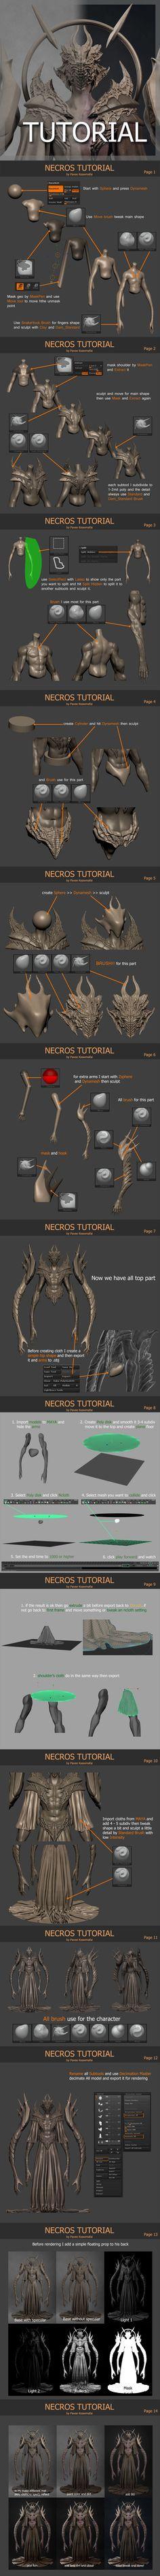 necros__tutorial__by_khempavee-d983hb7.jpg 1000×16051 пикс